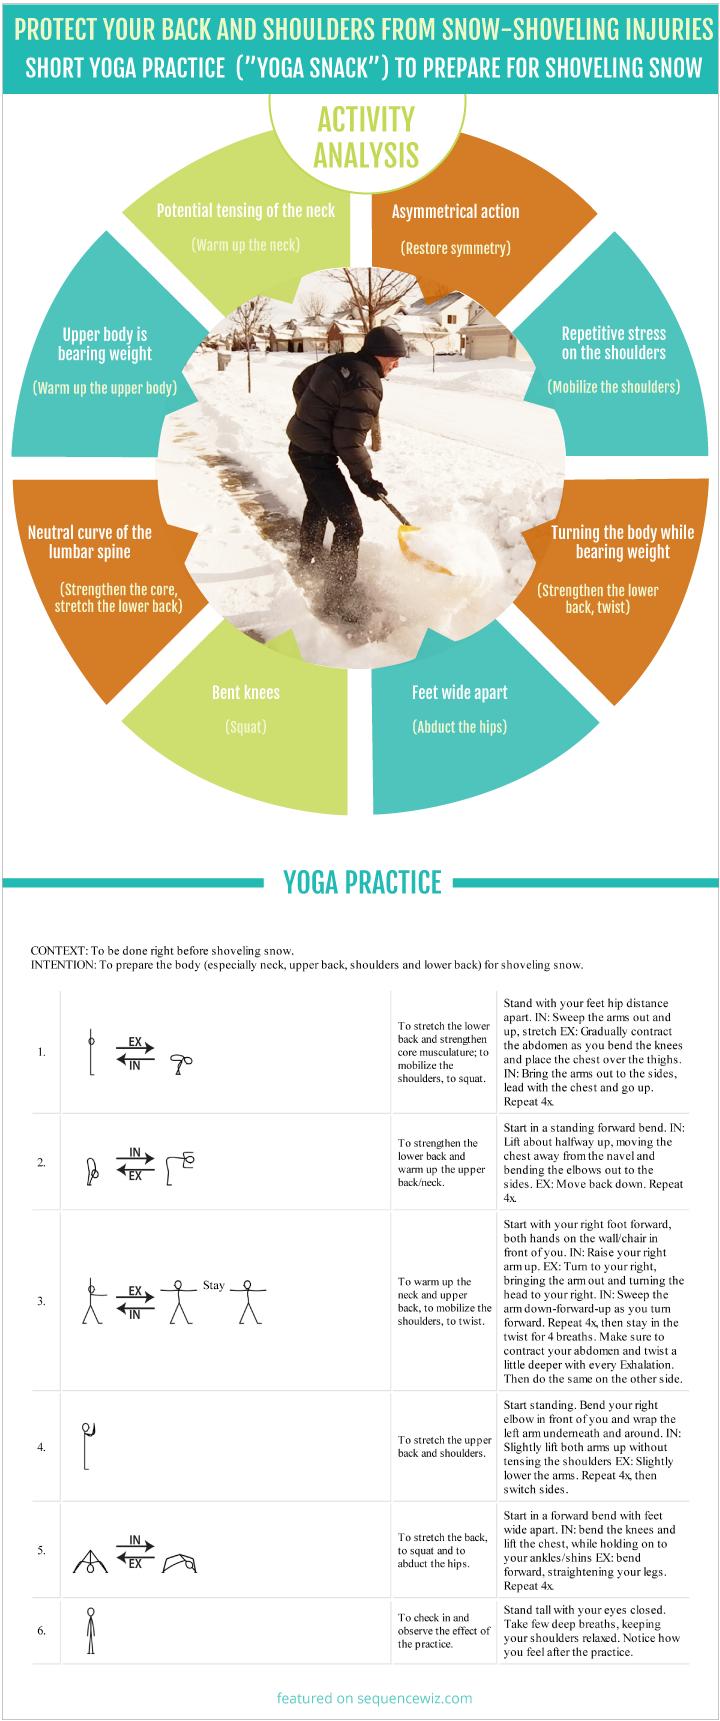 Show Shoveling Yoga Practice